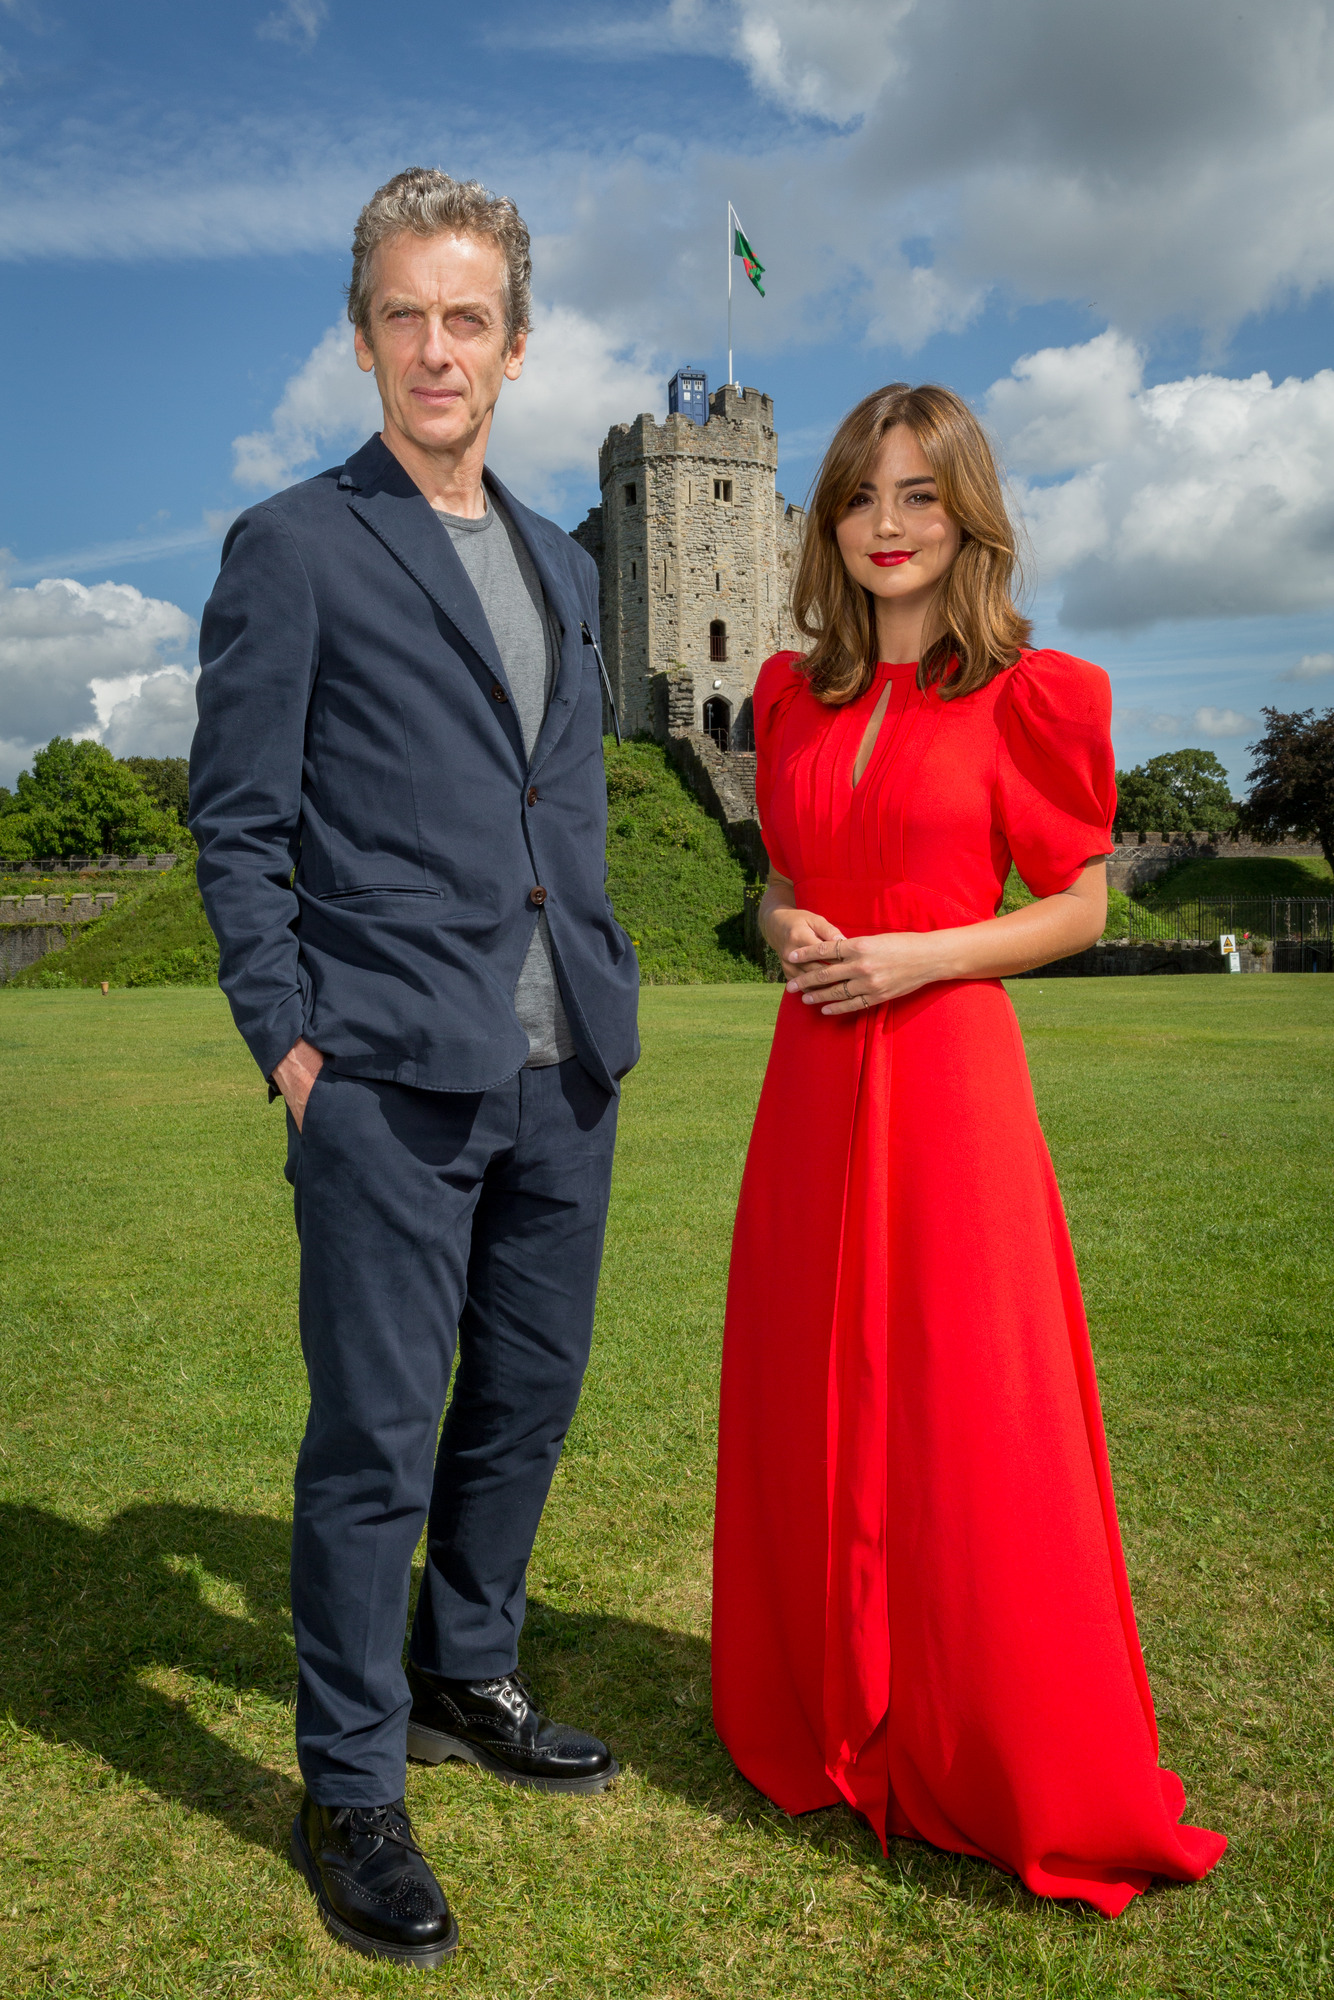 Doctor Who: No flirting but Peter Capaldi says Doctor still loves Clara